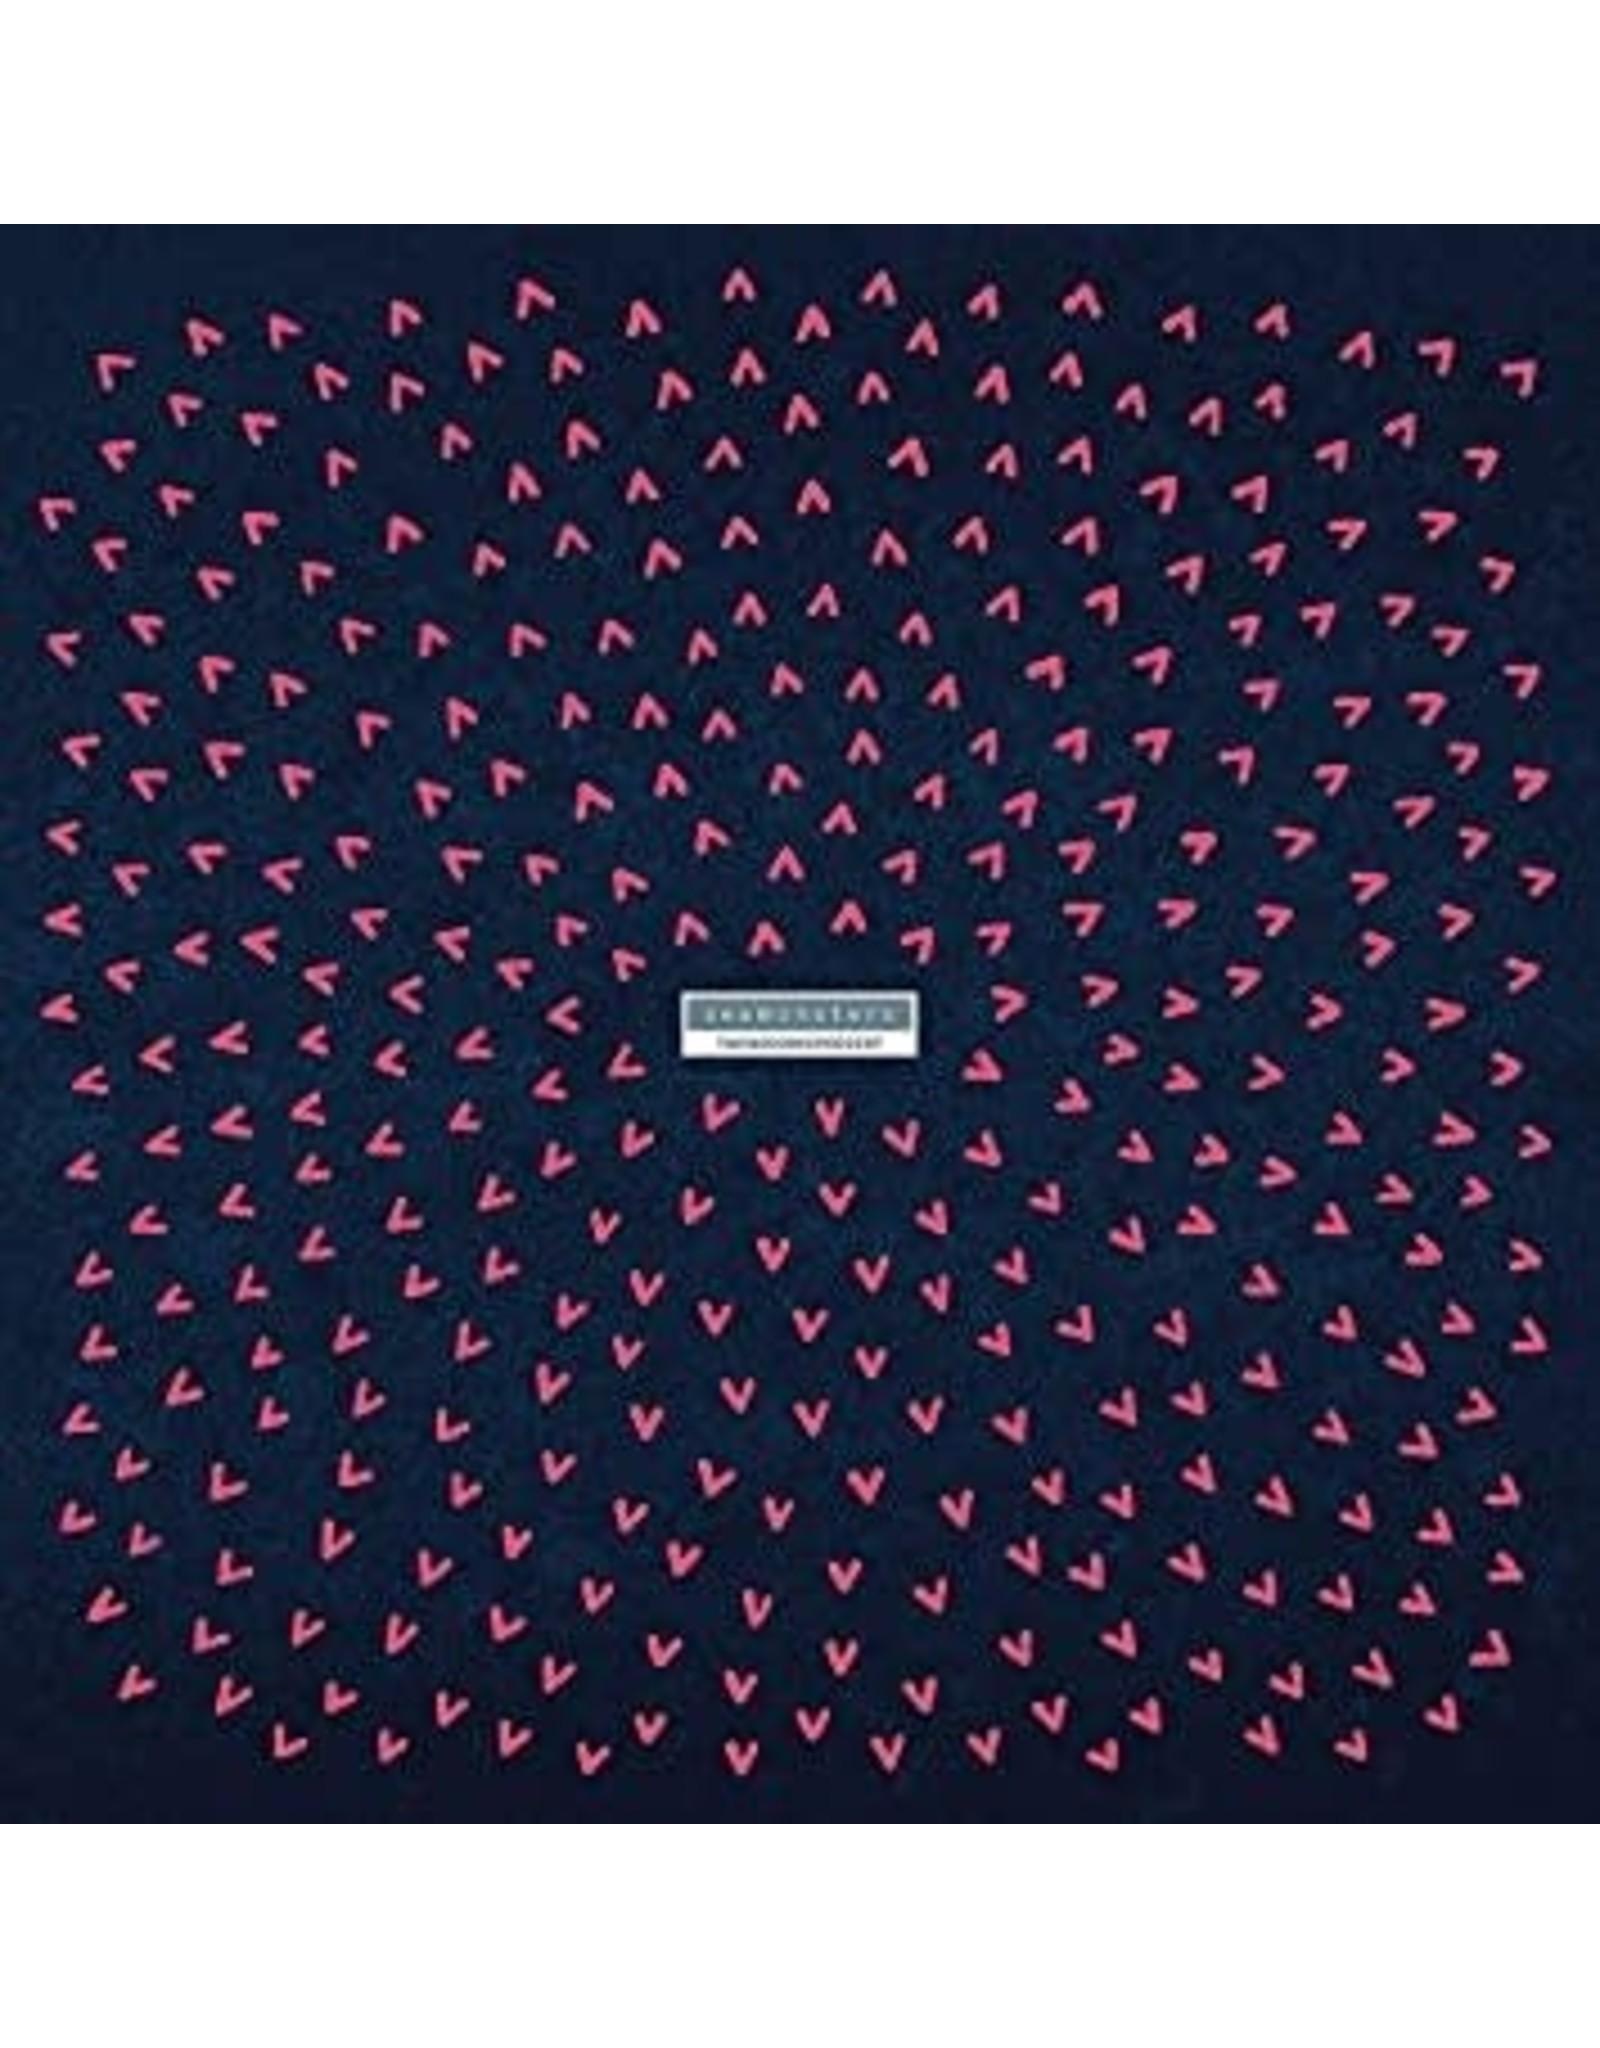 RCA Wedding Present: Seamonsters LP